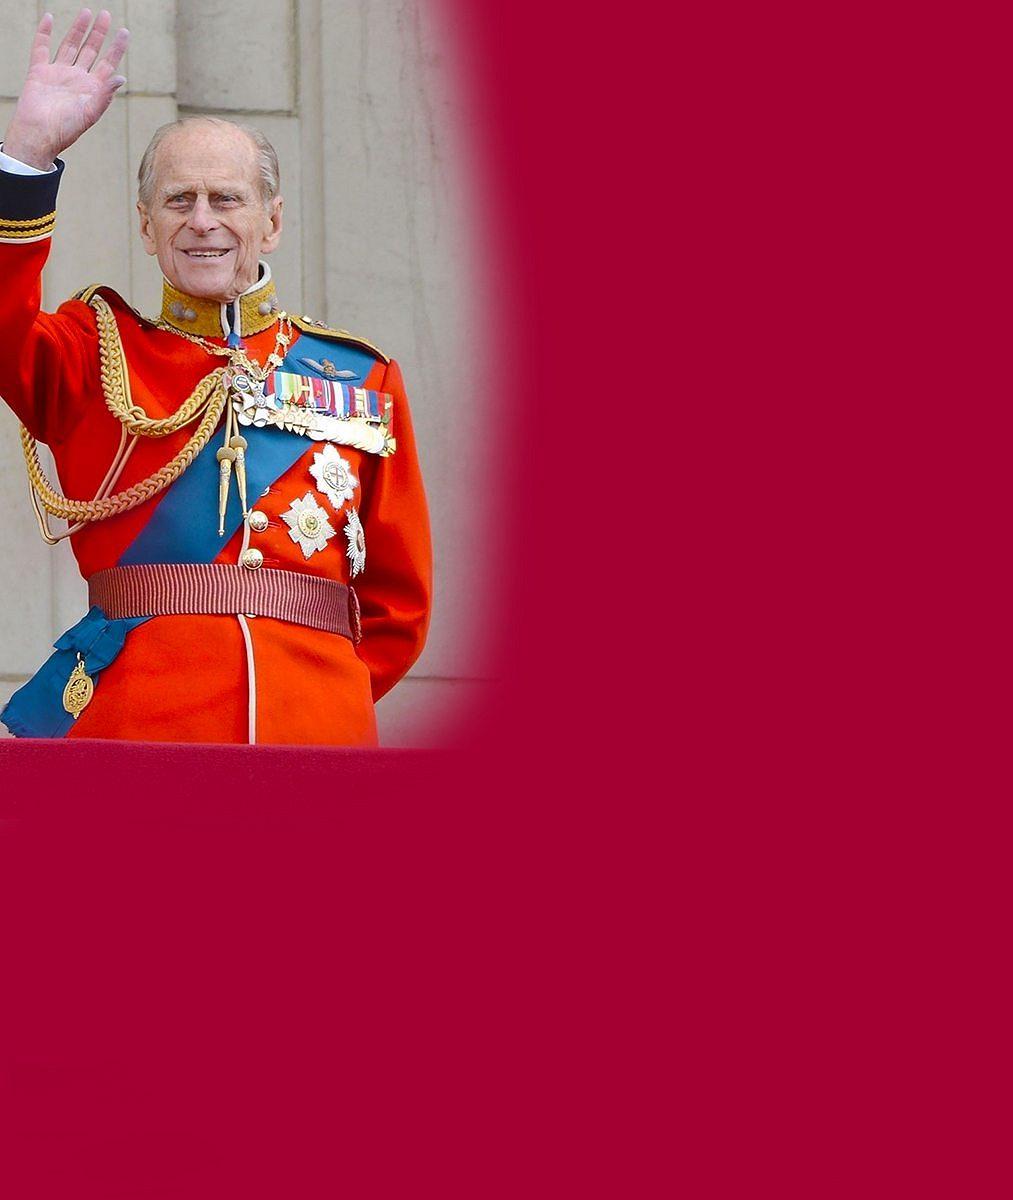 Poslední rozloučení s princem Philipem (✝99). William s Kate už dorazili na Windsor